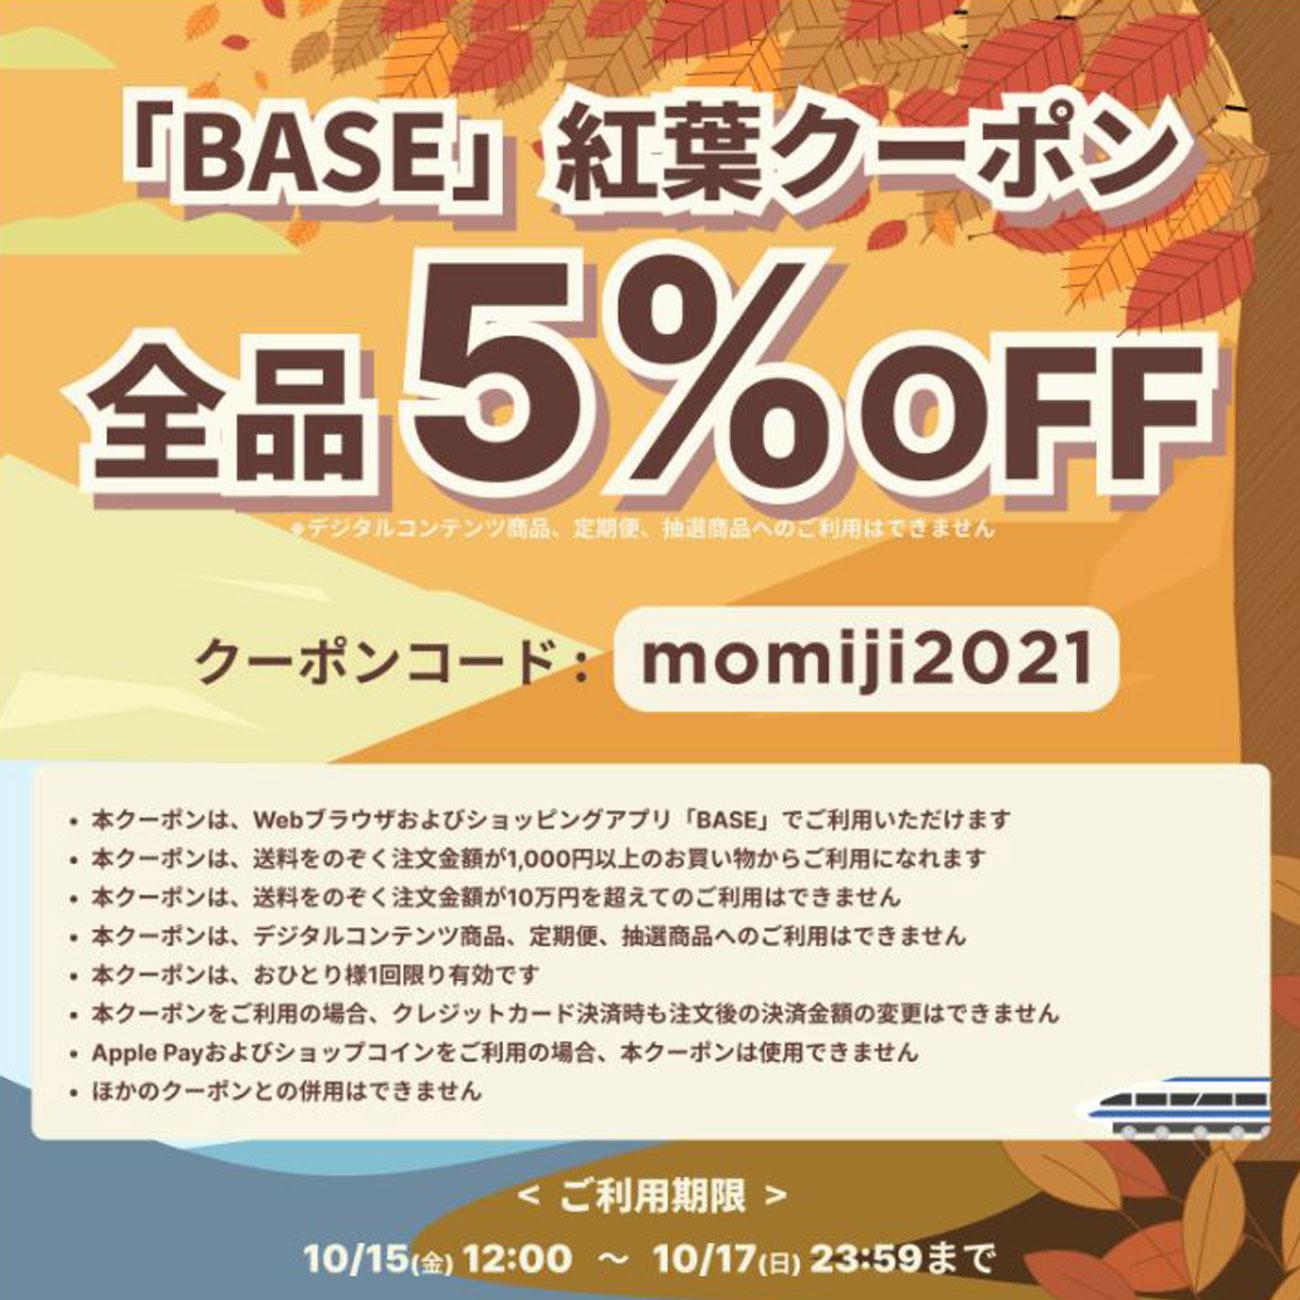 【NYANX STORE】10/15(金)12時スタート!!お買い物の秋5%OFFクーポン!